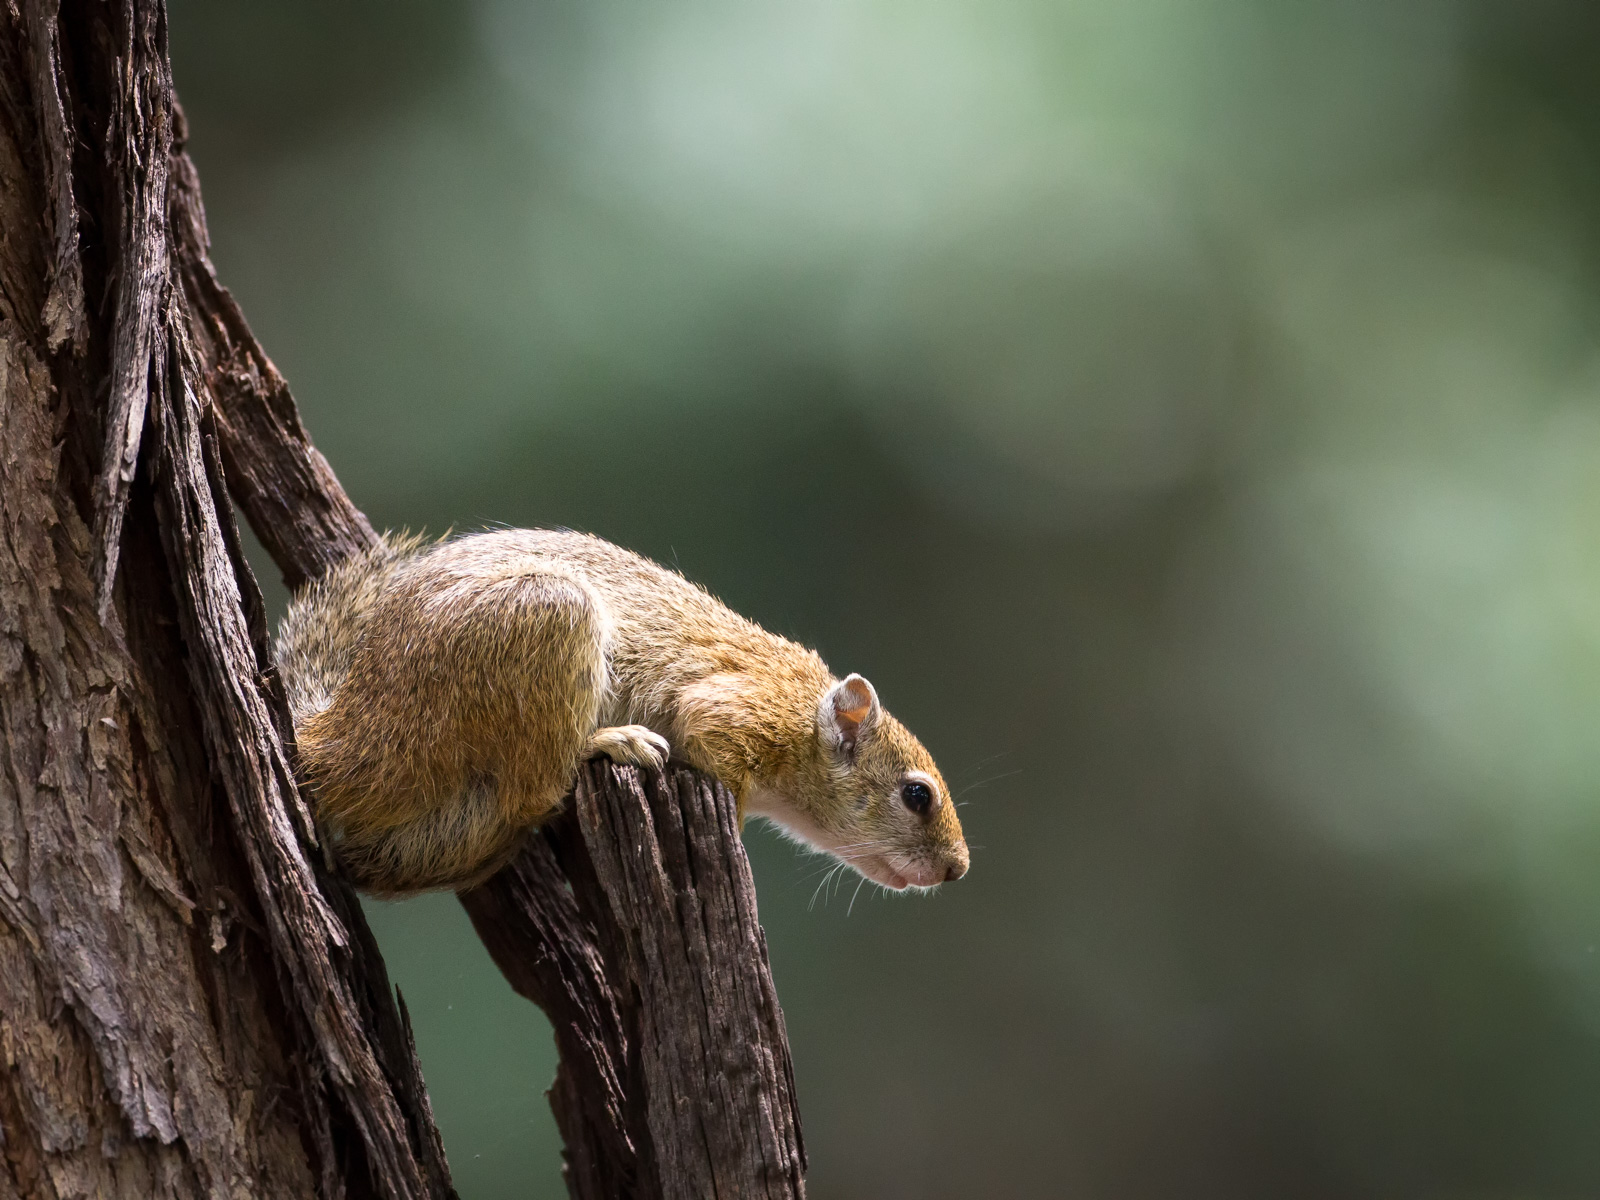 Squirrel (Botswana): Canon 7D, 500mm F4 @f4.0, 1/1000, ISO1600